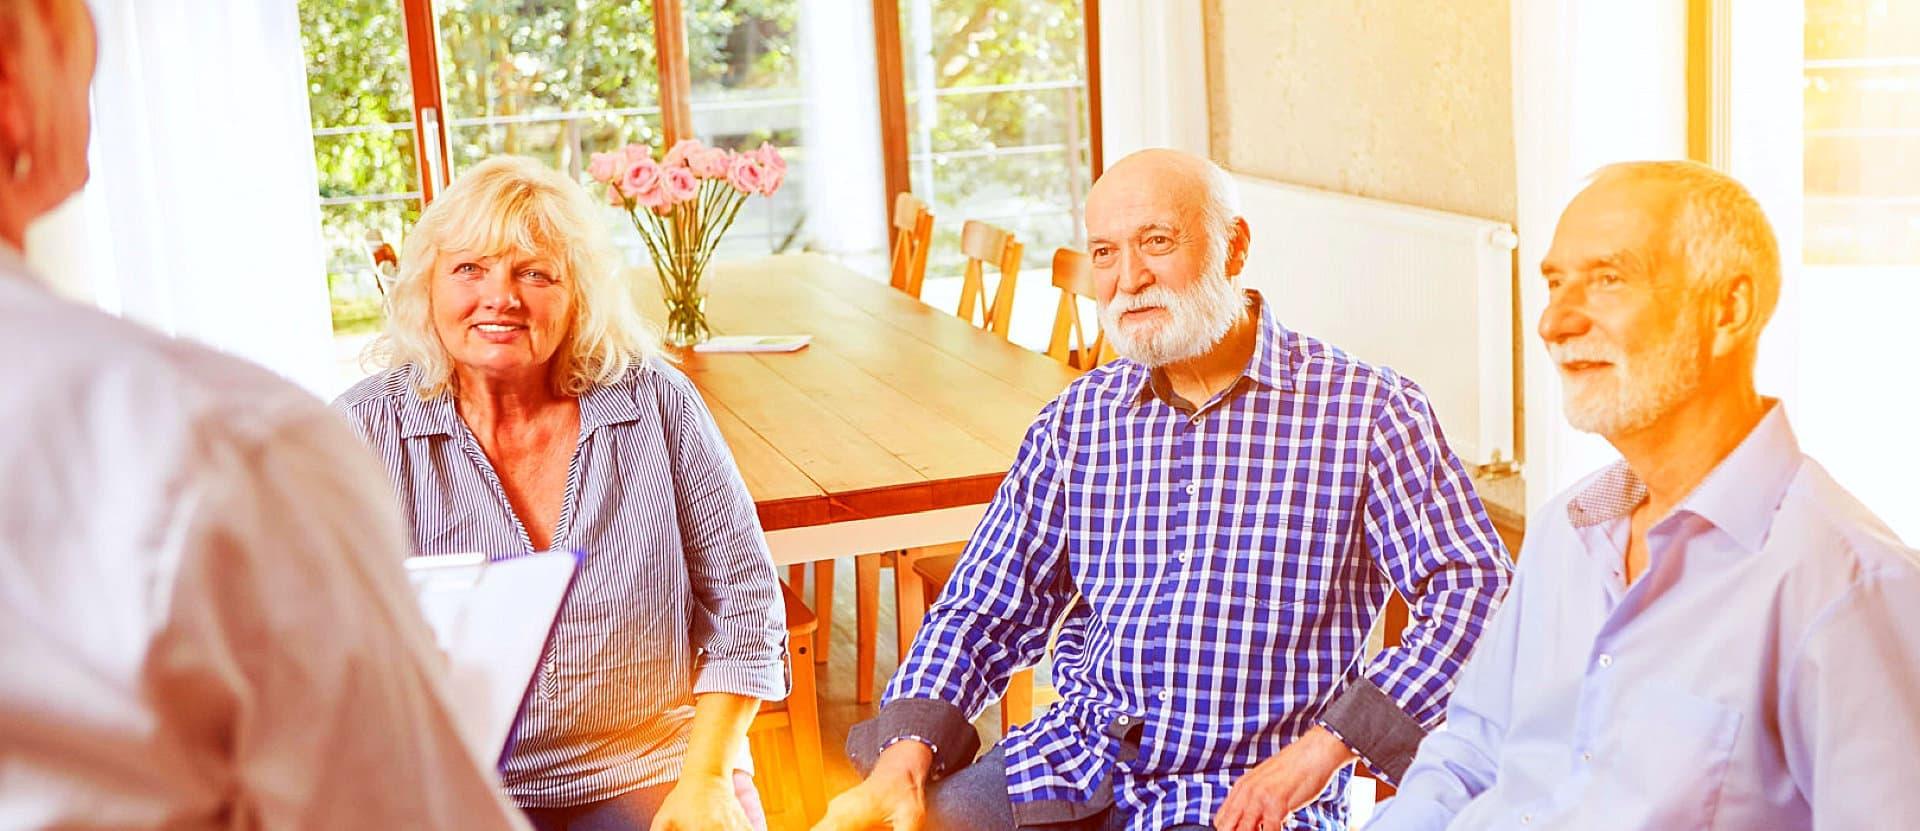 elderly listening together